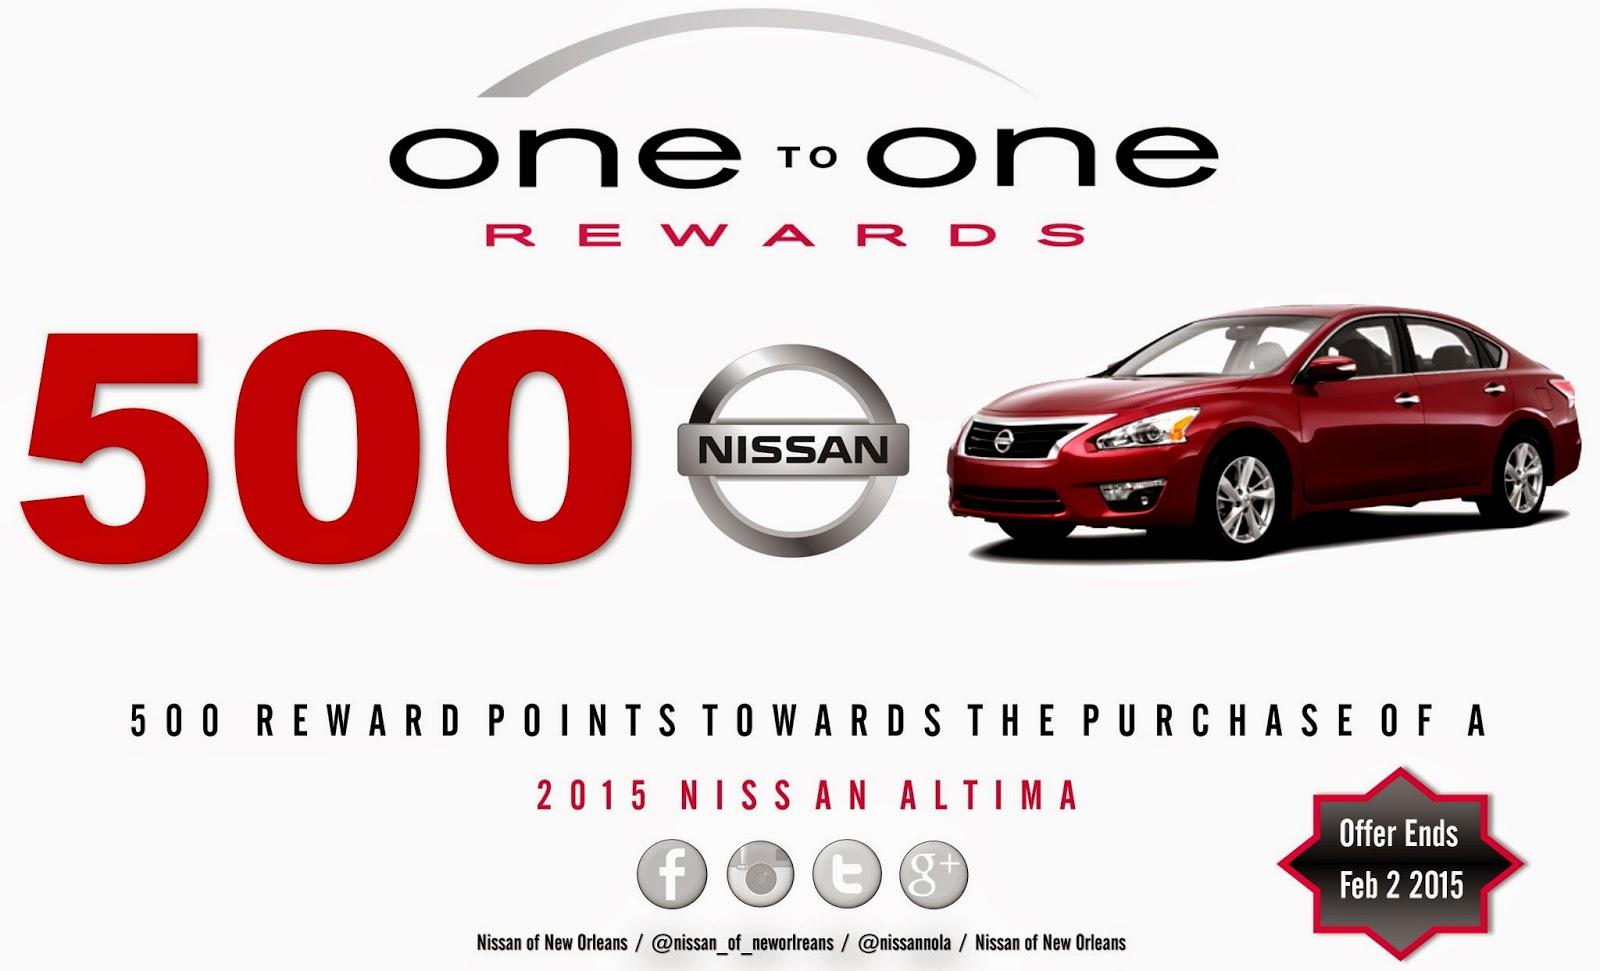 la copart nissan left en cert orleans on online new of salvage carfinder view auto title sale bas auctions altima lot beige in